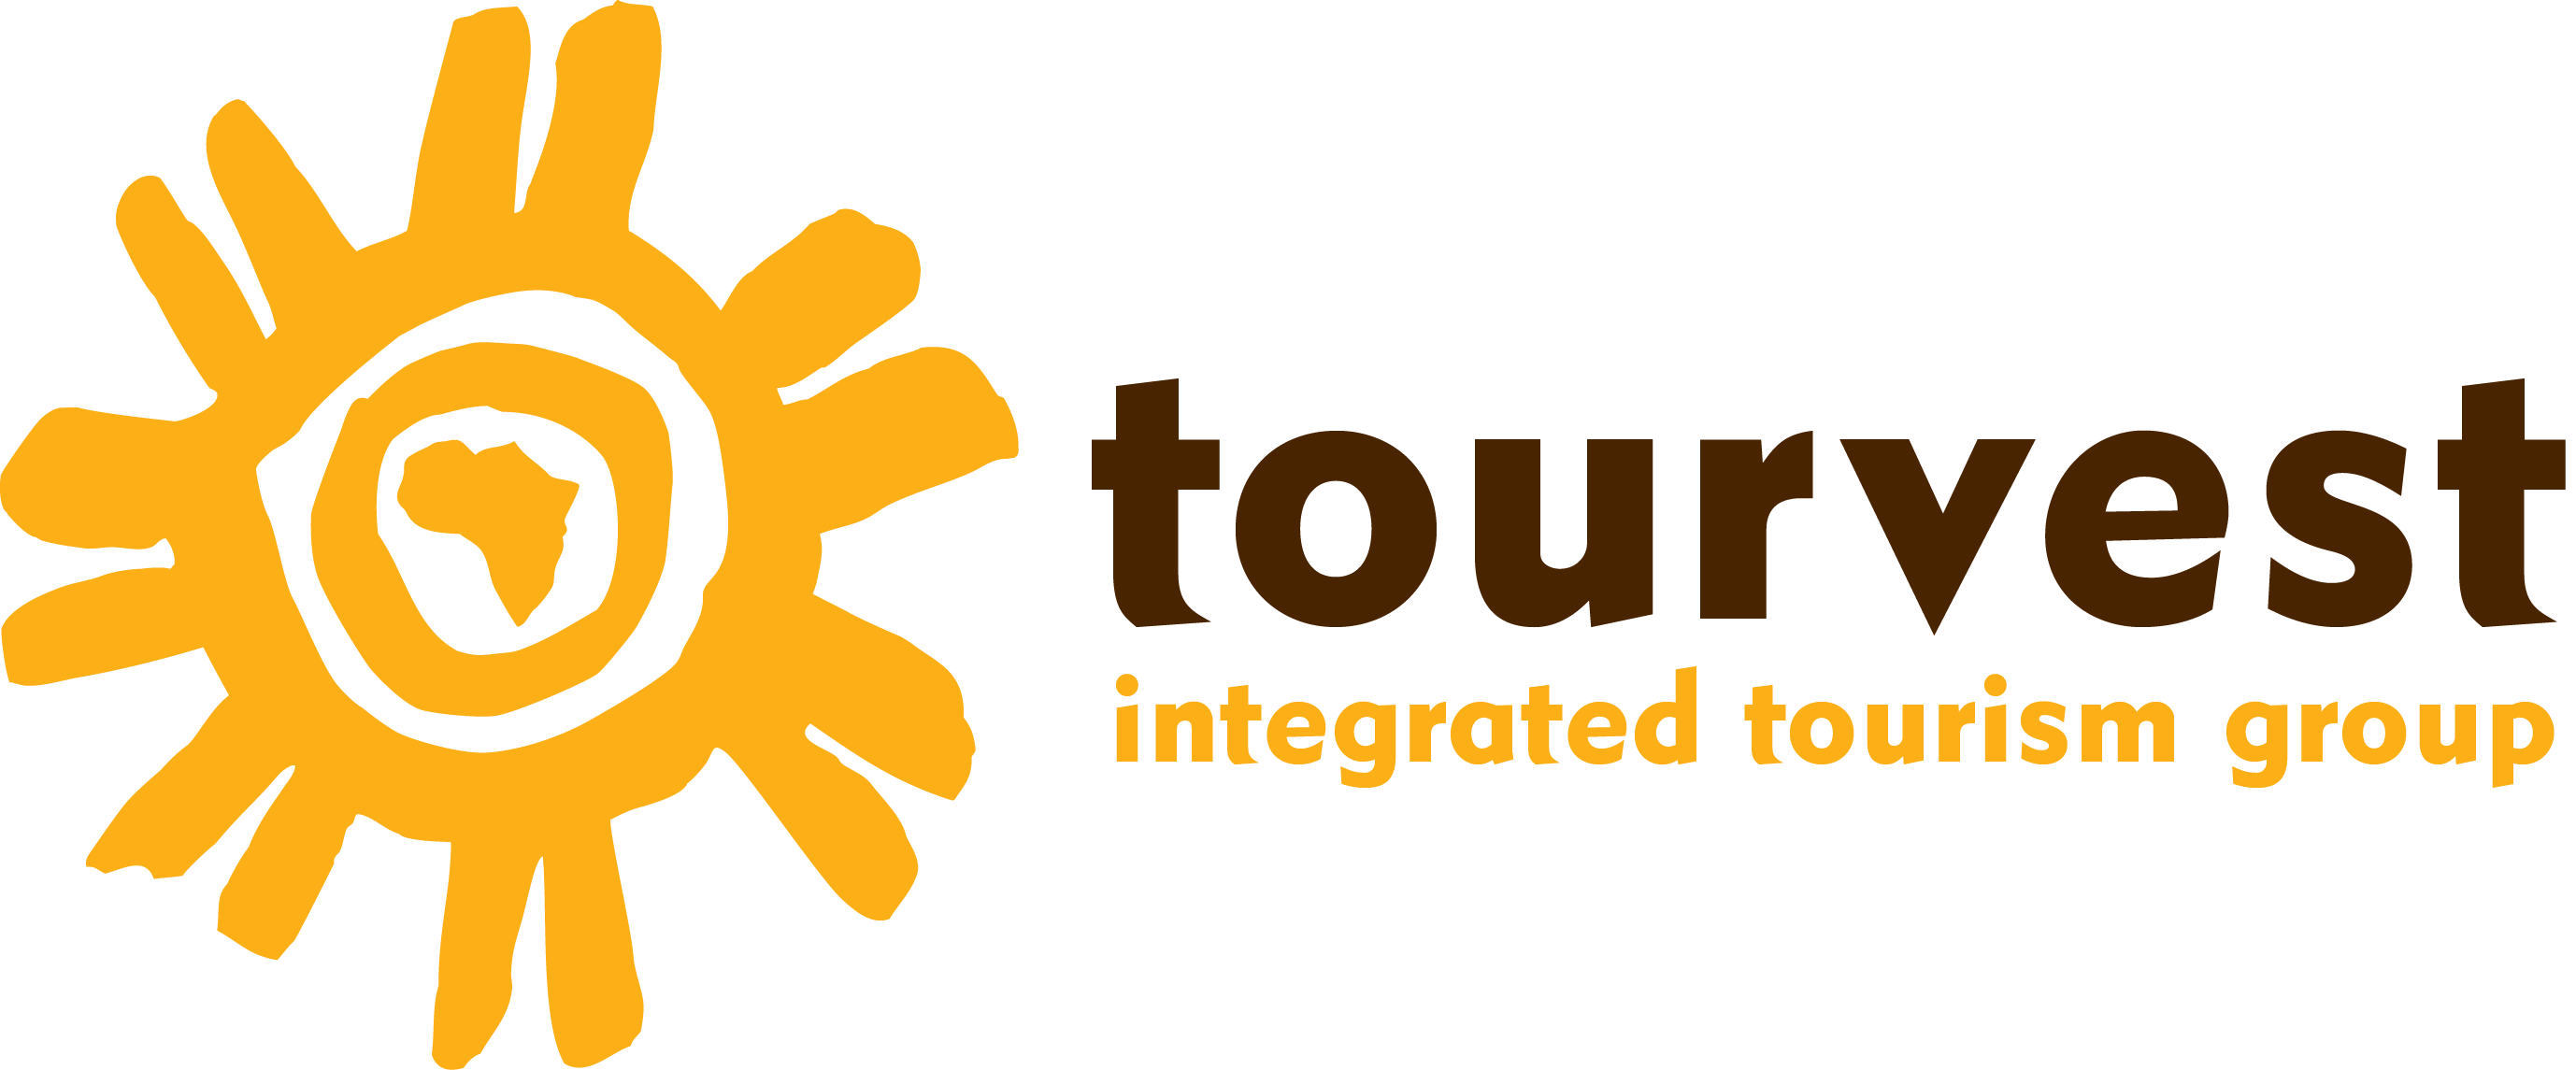 Tourvest Integrated Tourism Group Logo